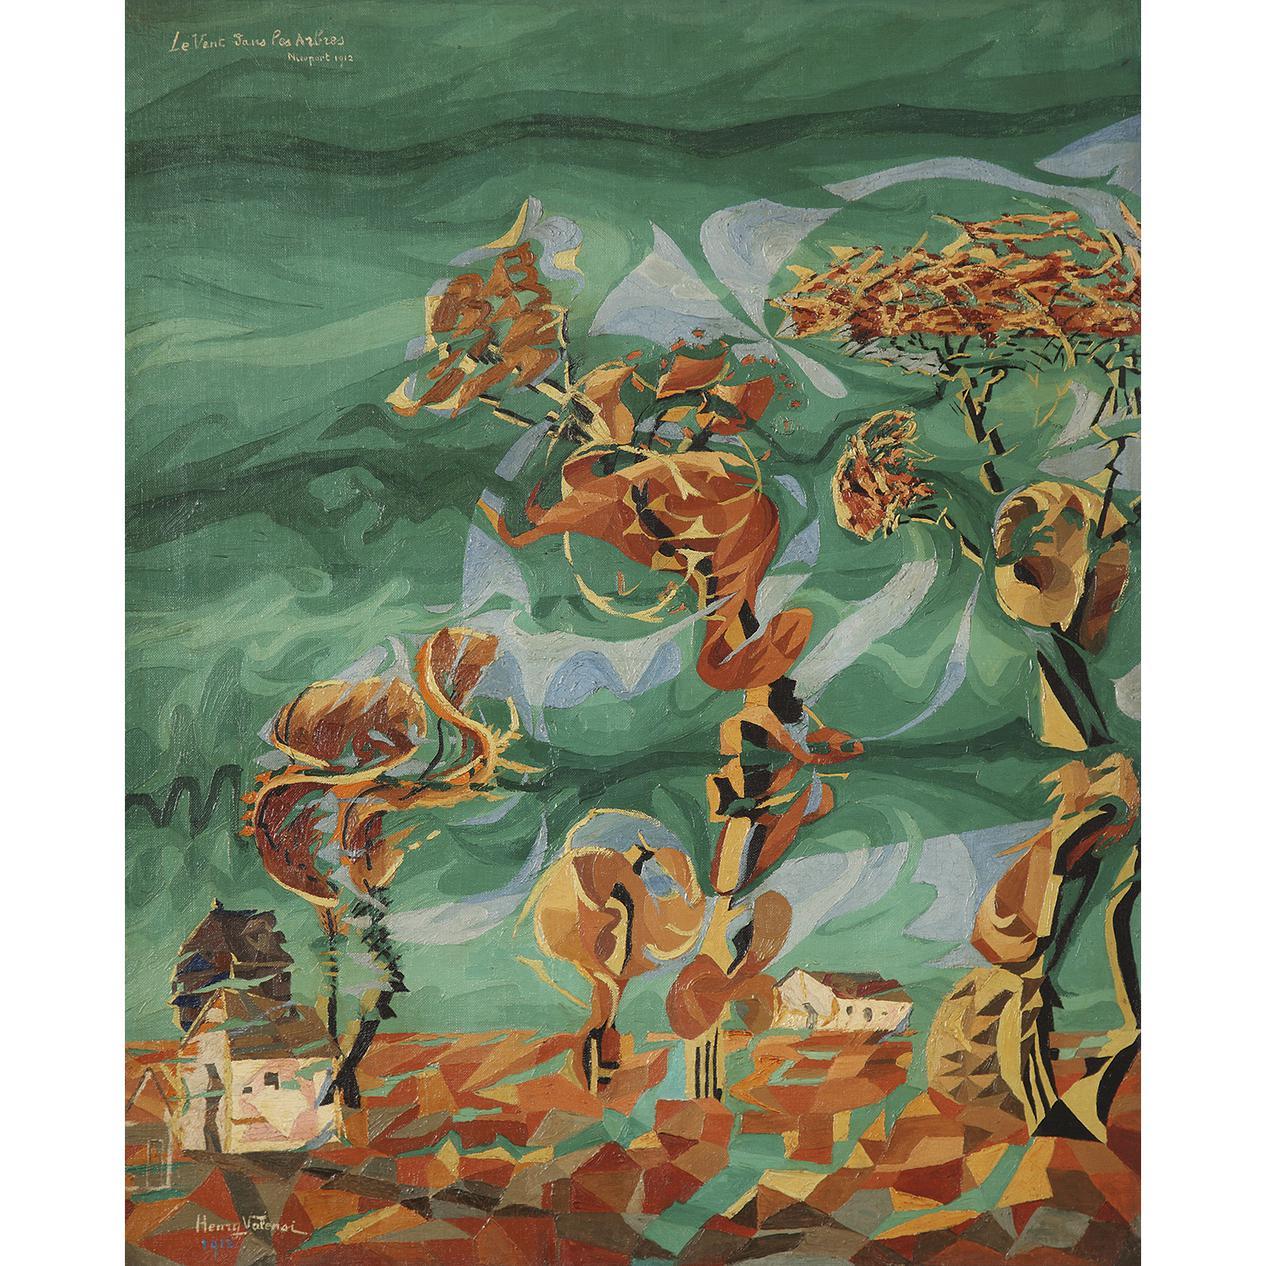 Henry Valensi-Le Vent Dans Les Arbres-1912